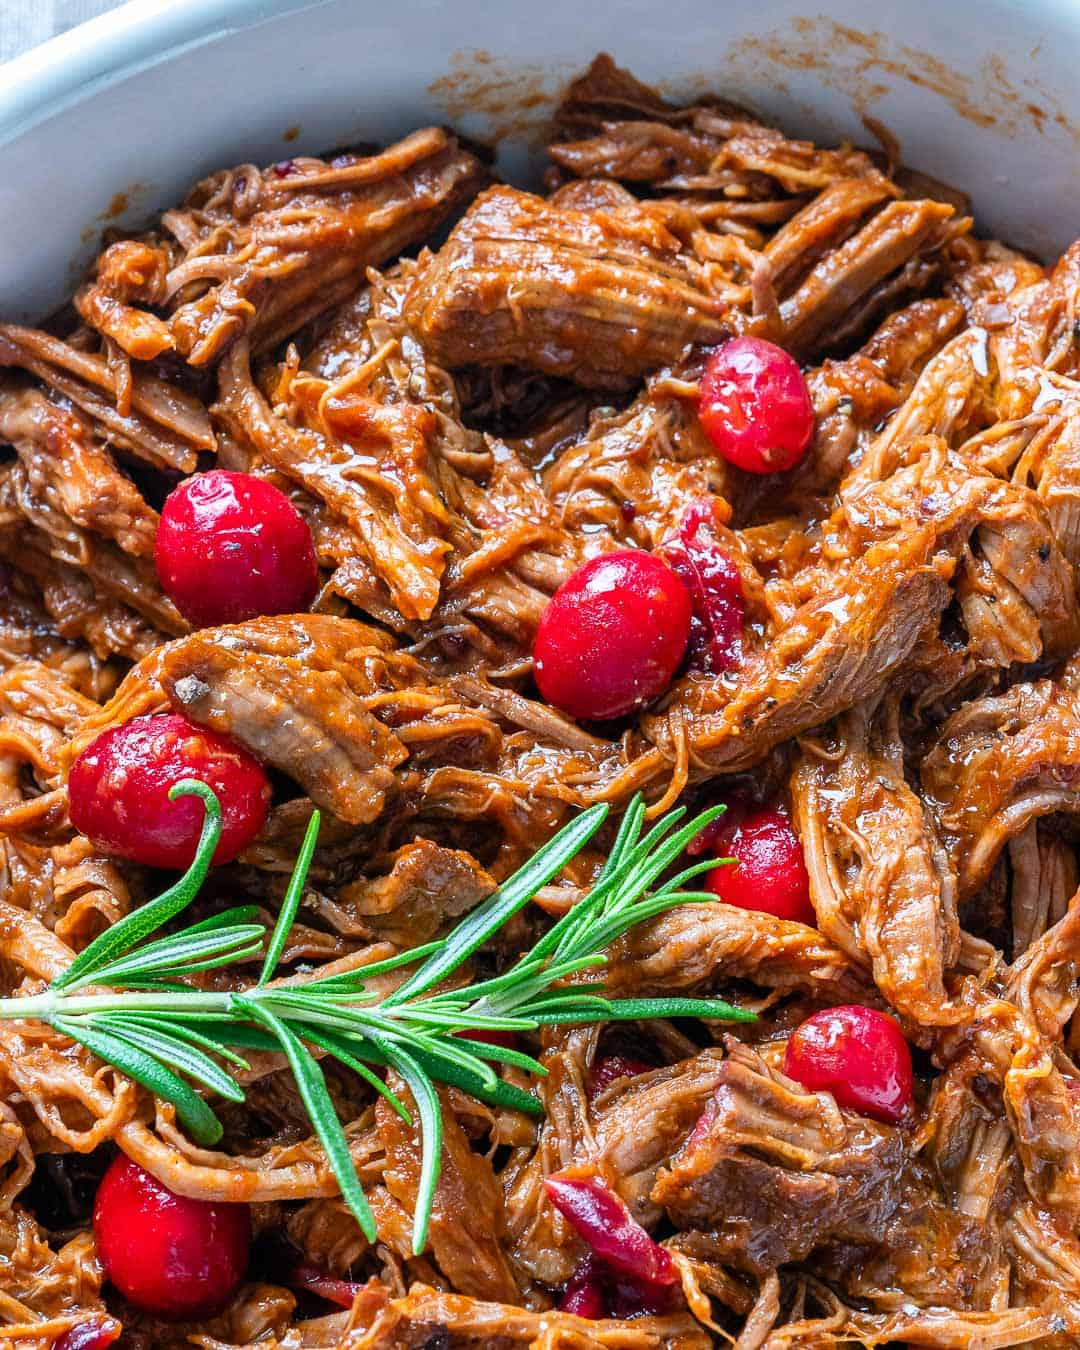 cranberry sauce with beef brisket